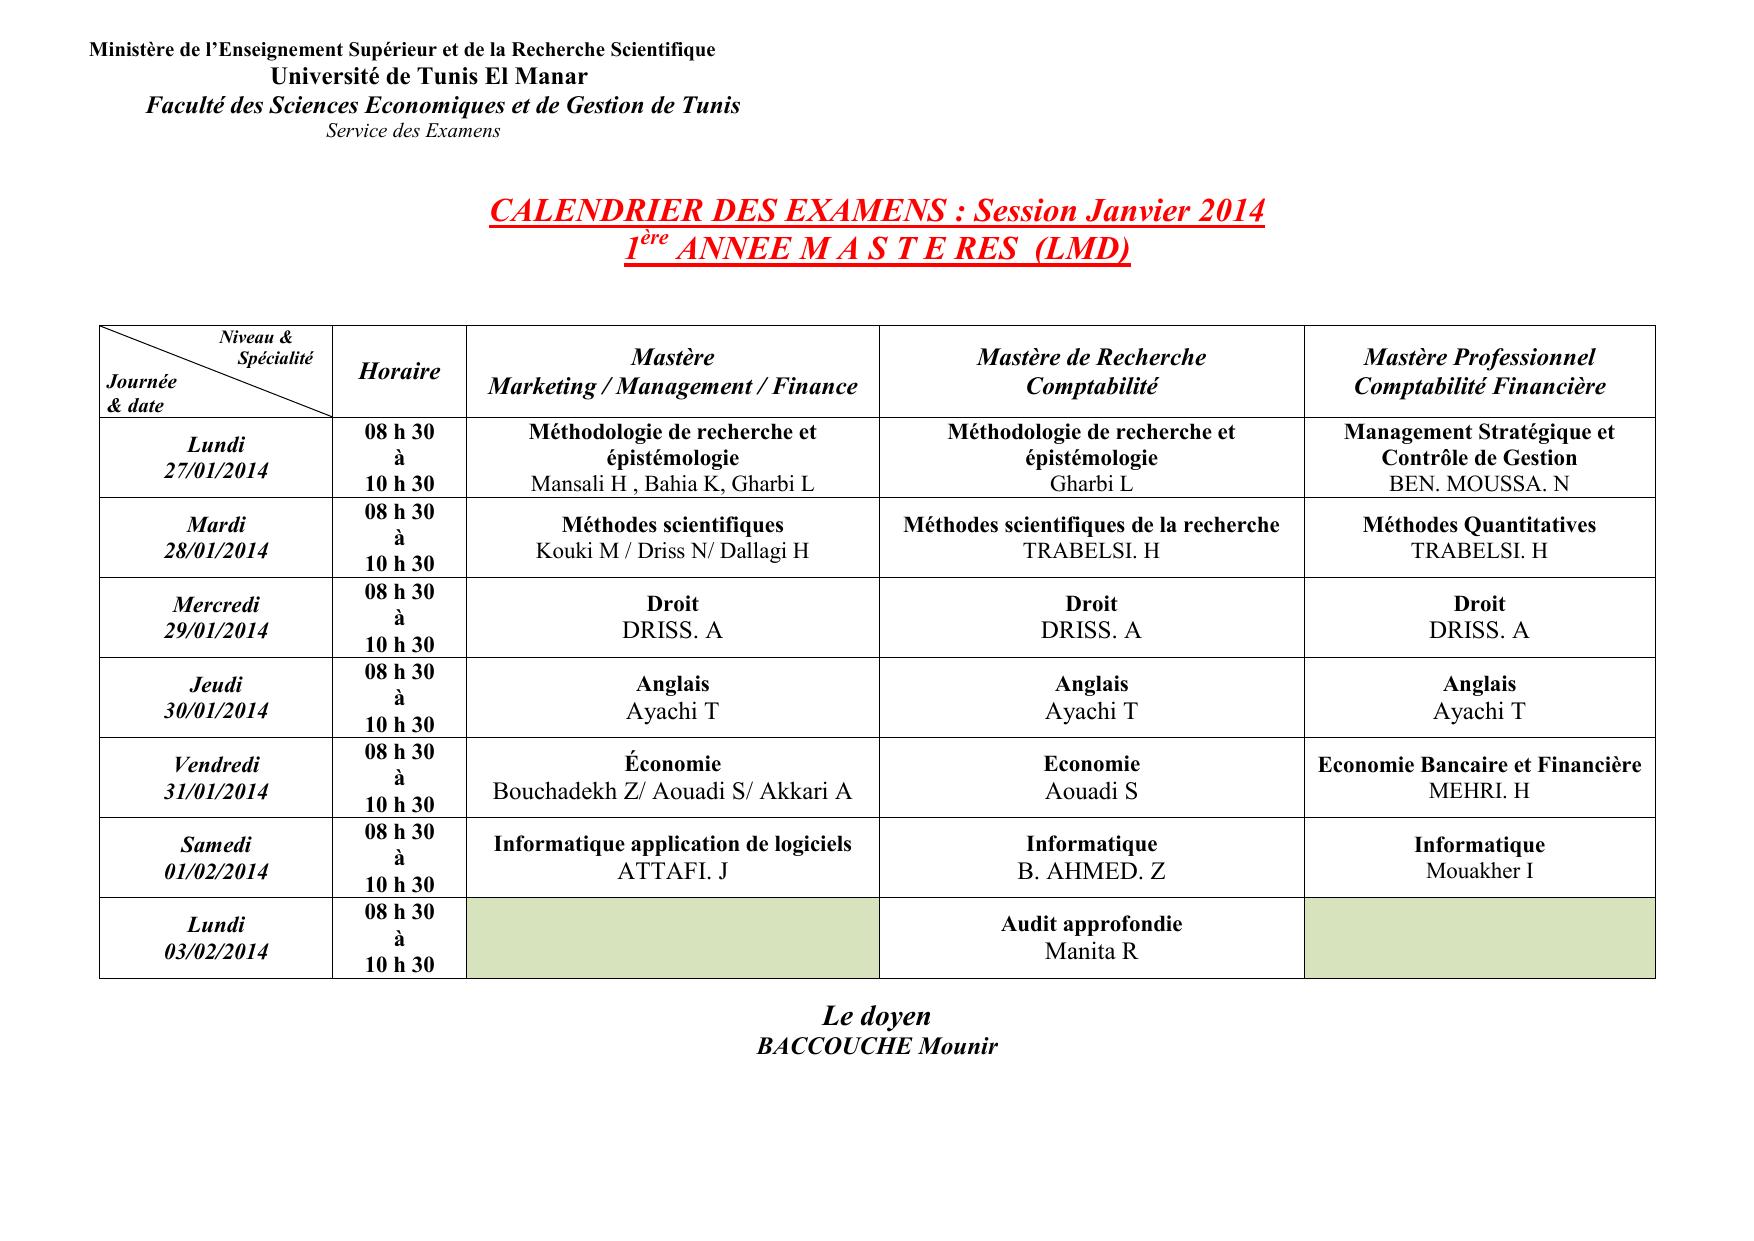 Calendrier Des Examens Sciences Po.Calendrier Des Examens Session Janvier 2014 1